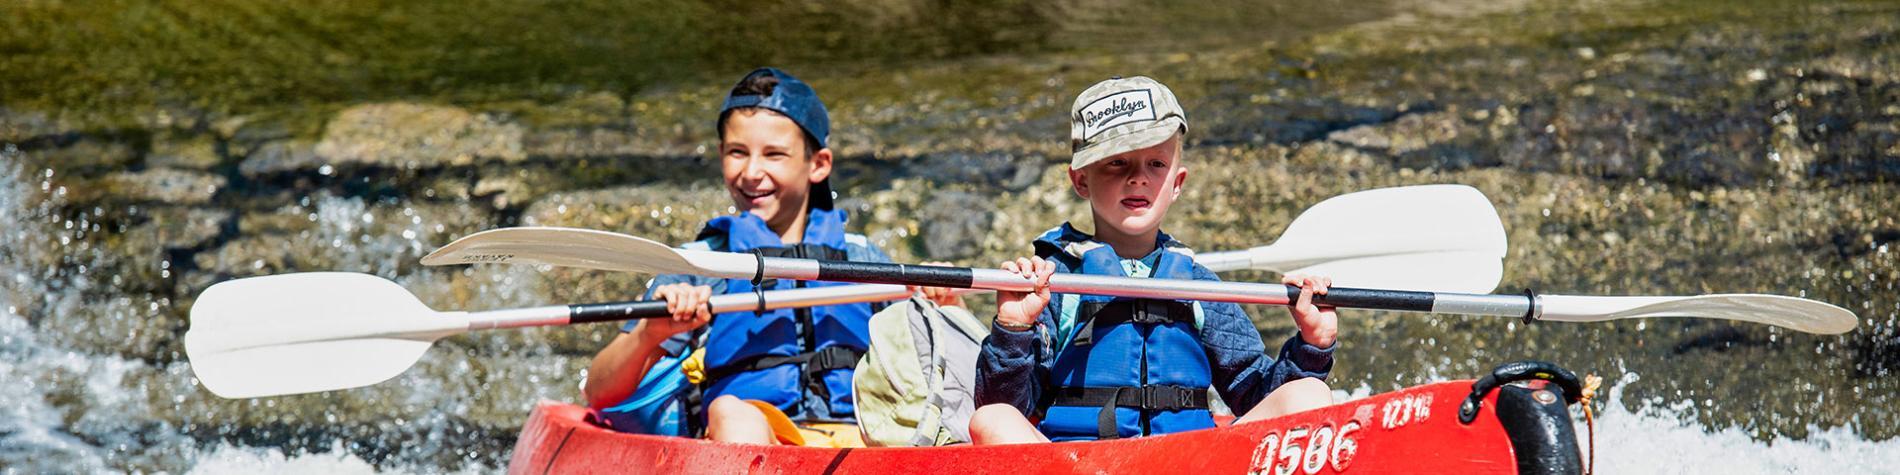 Lesse Kayaks - Les descentes - kayak - canoë - Dinant Evasion